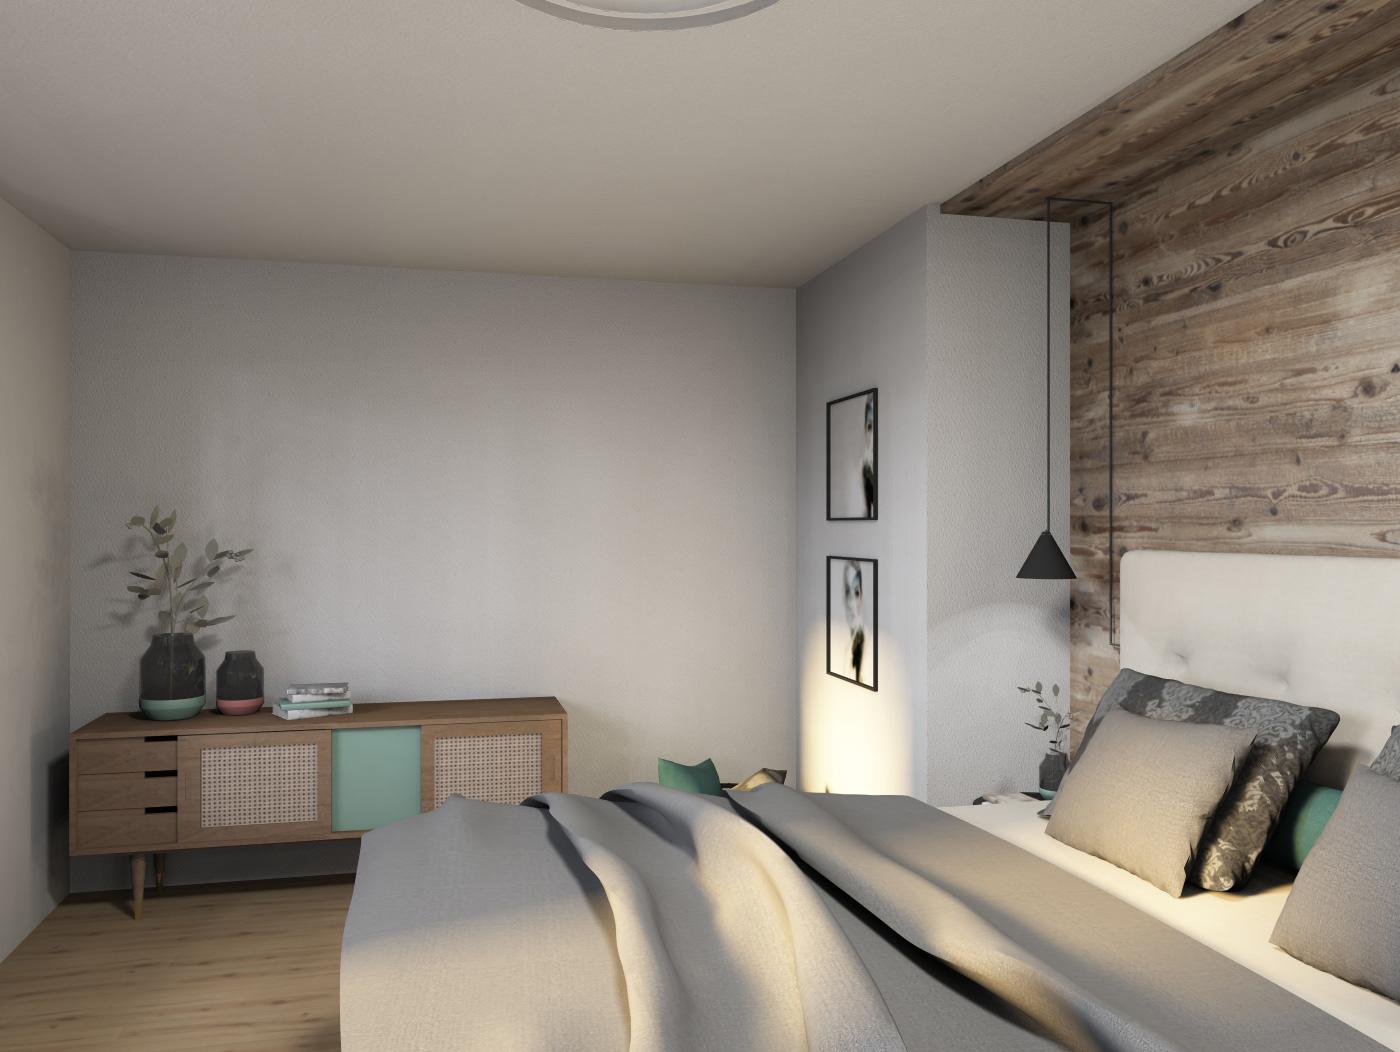 Schlafzimmer-altholz-boxspringbett